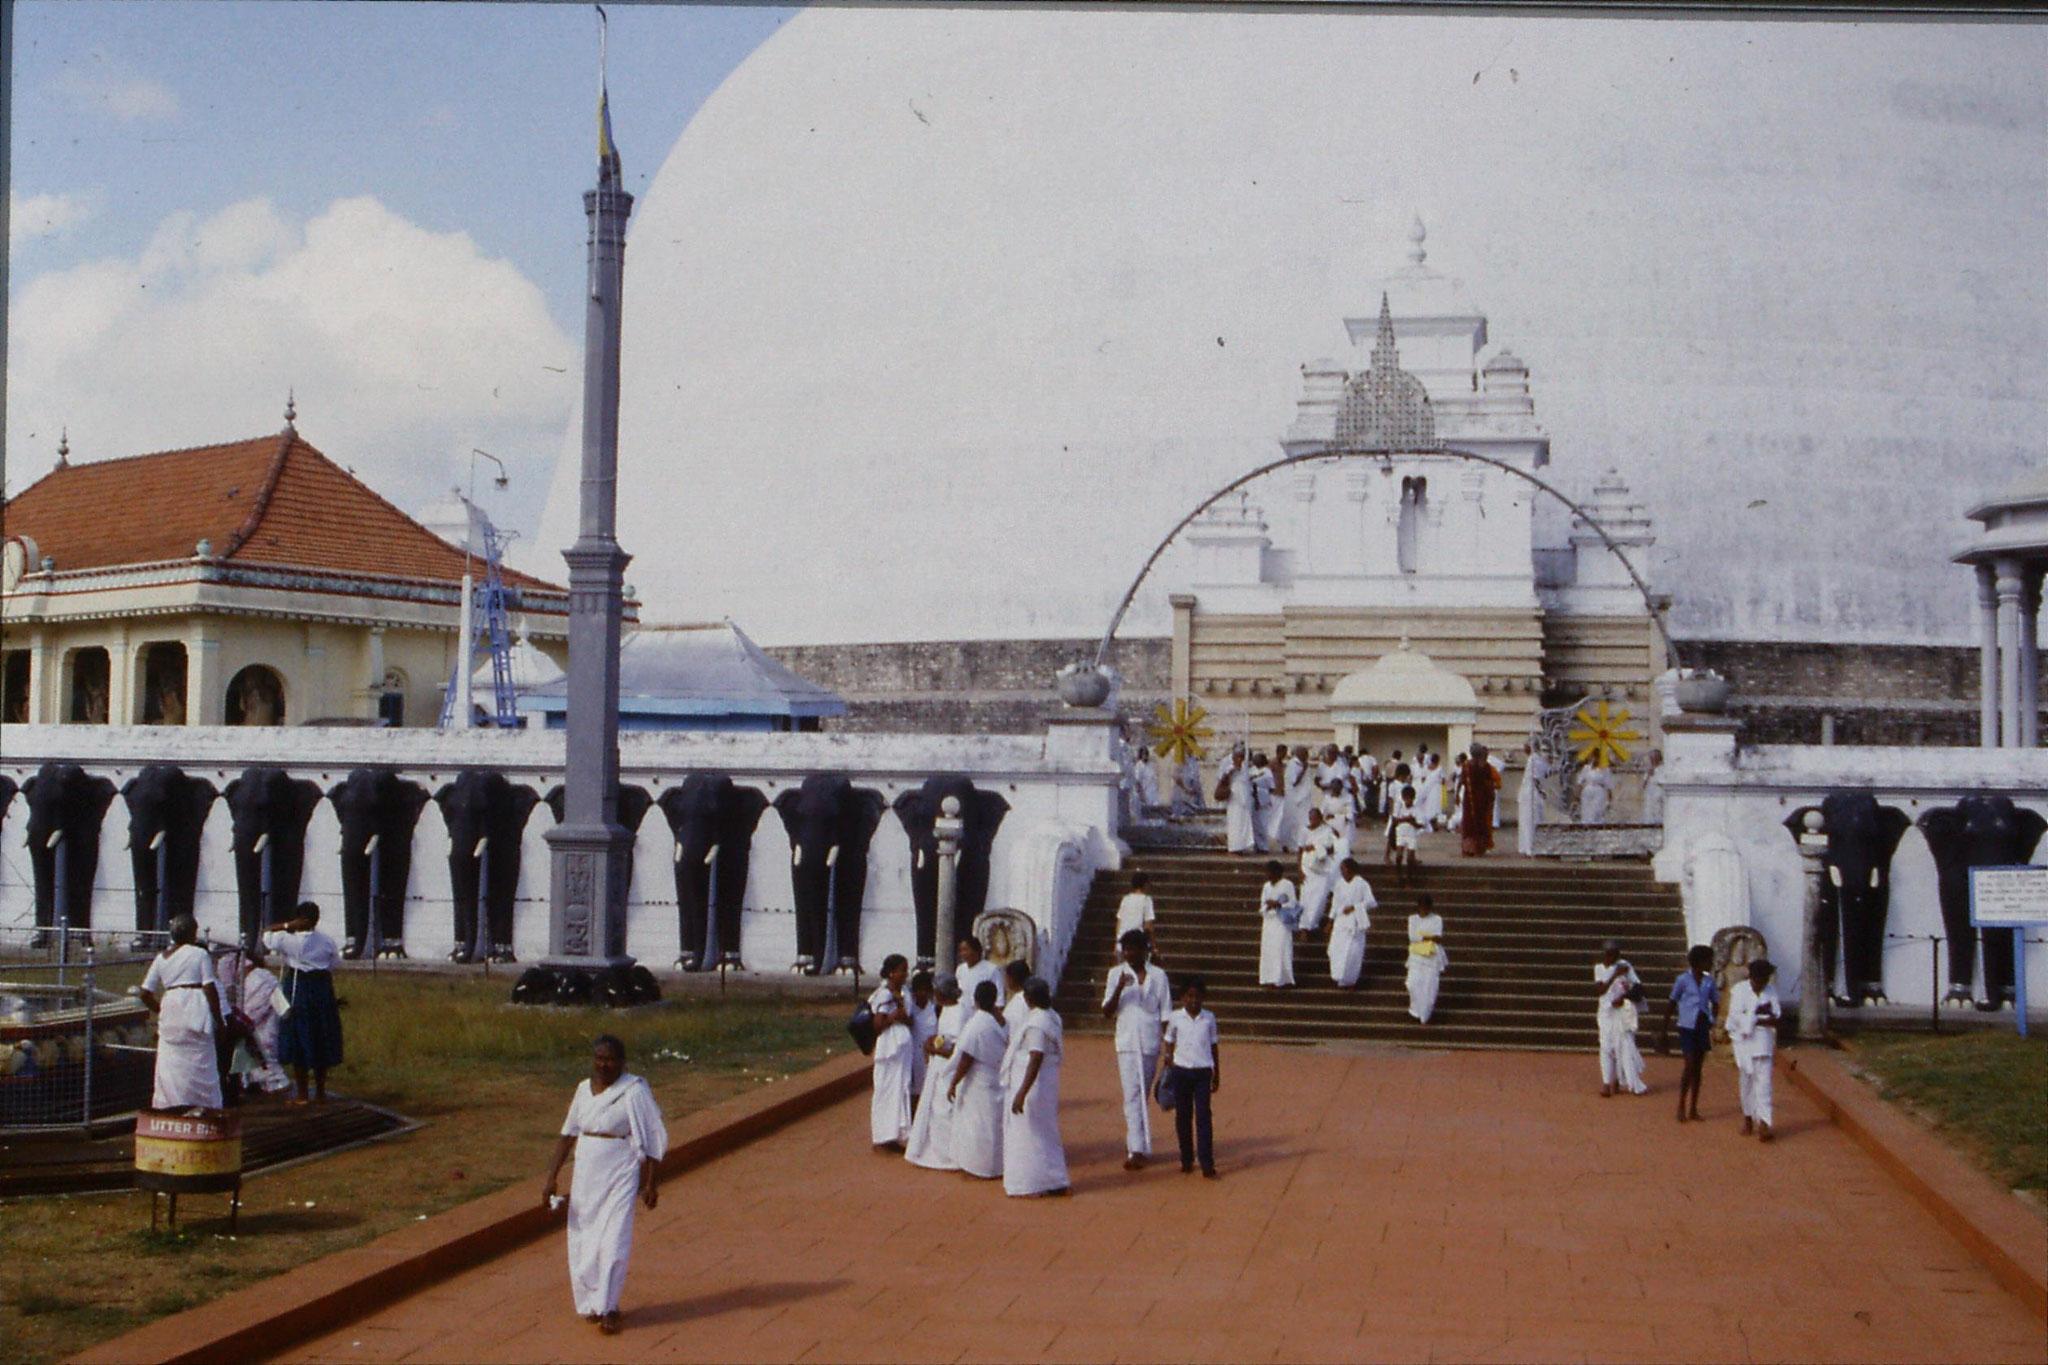 103/9: 9/2/1990 Anuradhapura Ruvanvelisiya dagoba approach (180ft)